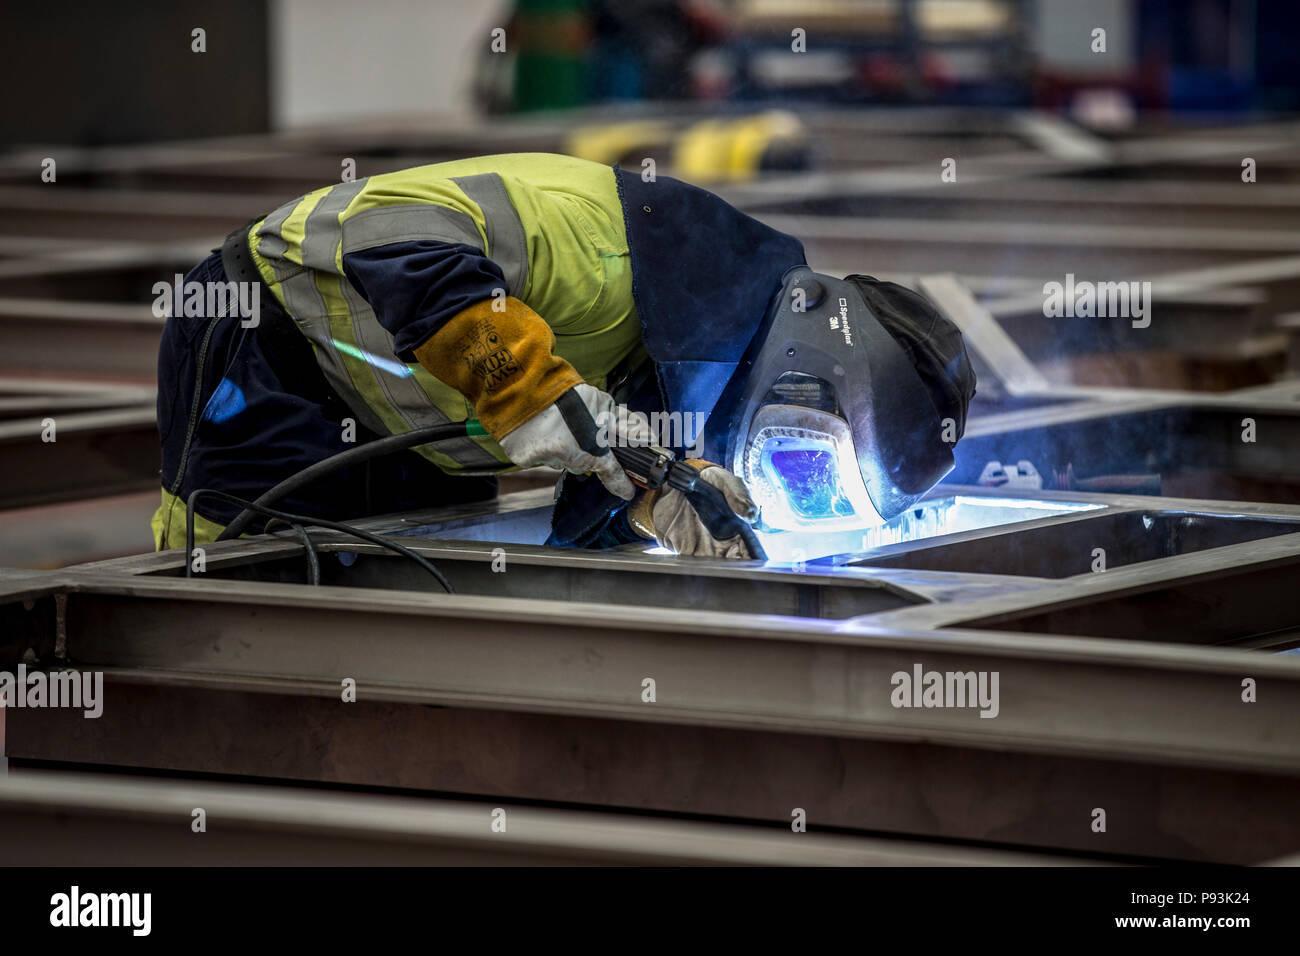 Saldatore indossare attrezzature di protezione saldatura Immagini Stock